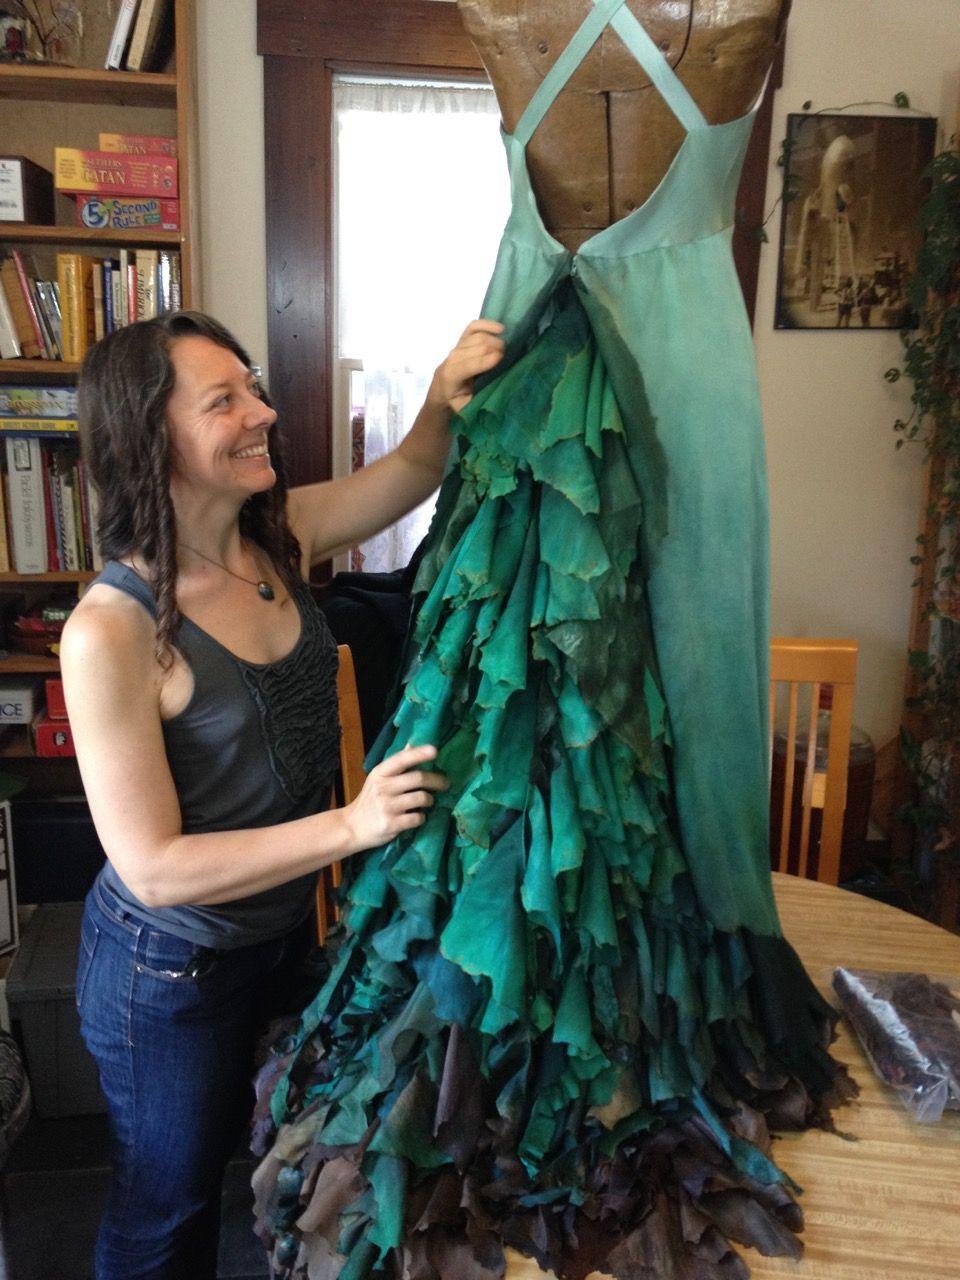 The Magic Forest Wedding Dress - a beautiful collaboration! | Magic ...